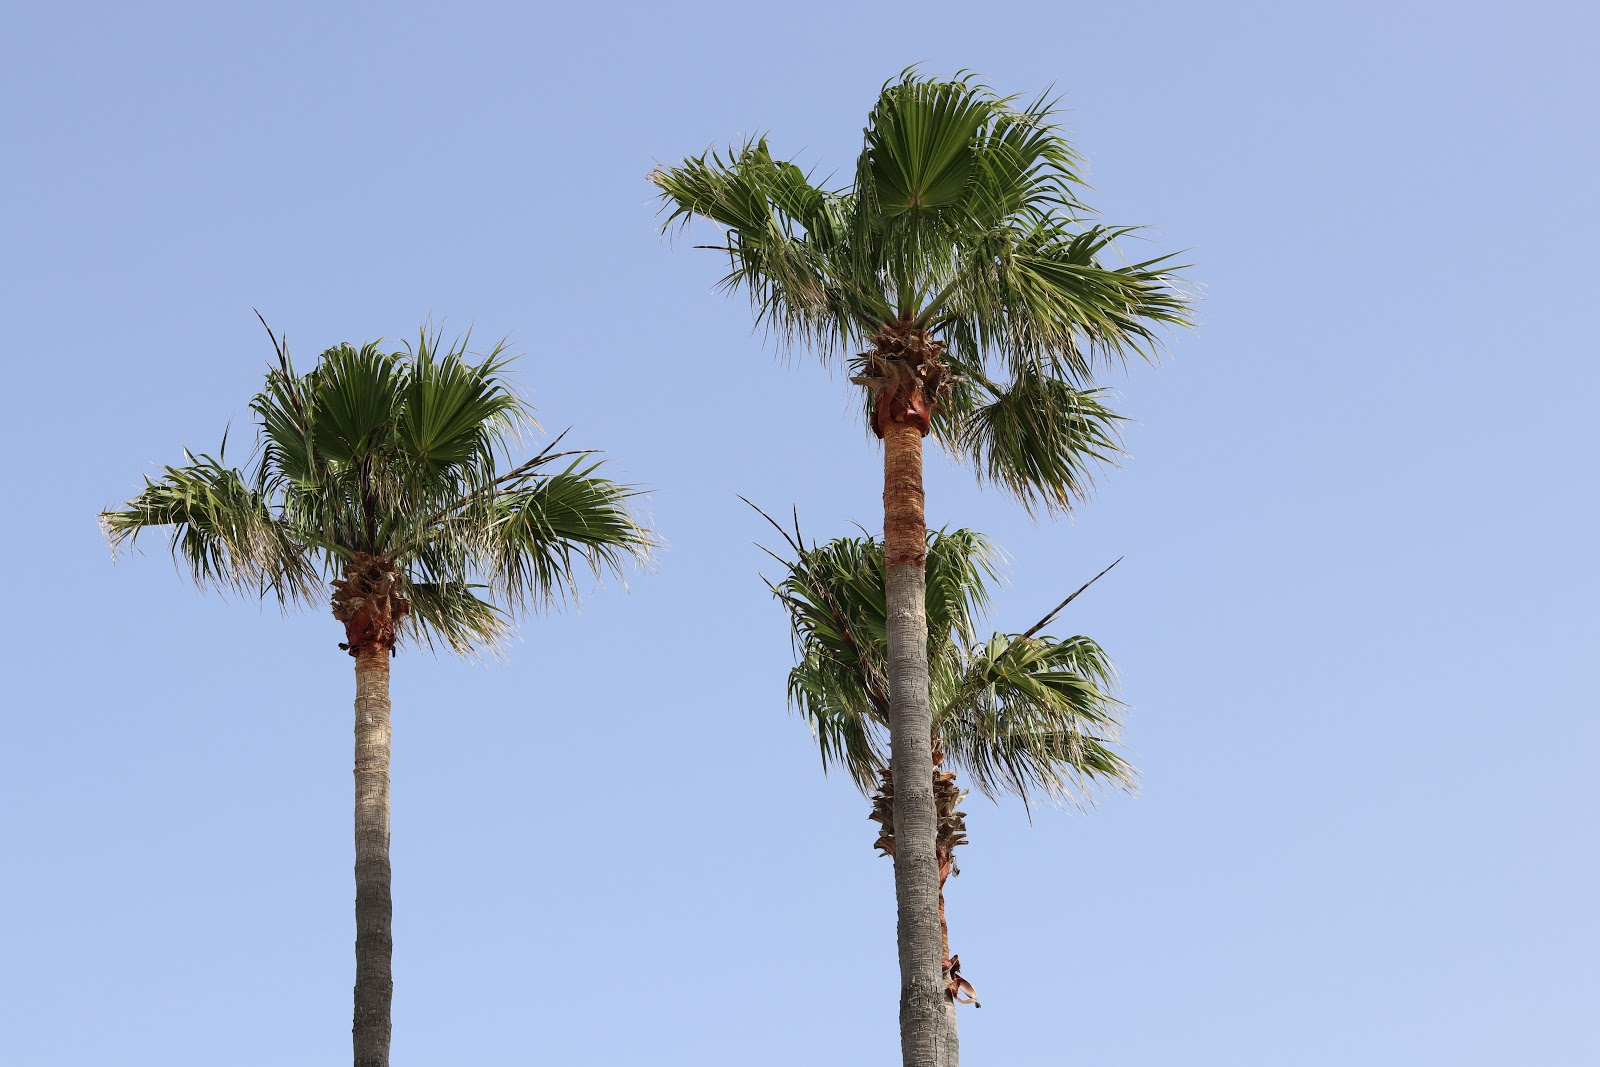 Green Palm Trees against blue sky, Sotogrande, Spain